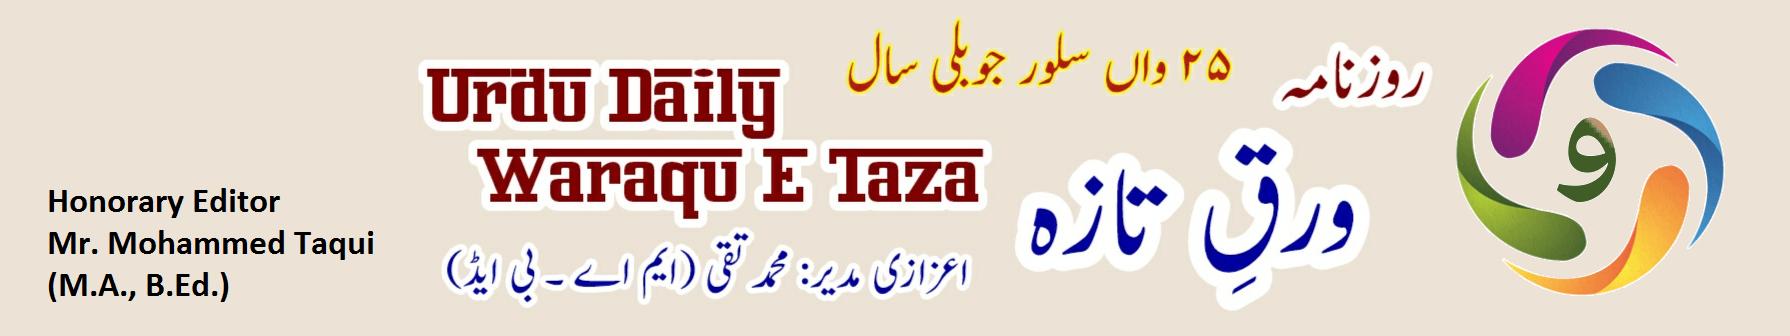 Waraqu E Taza روزنامہ ورق تازہ